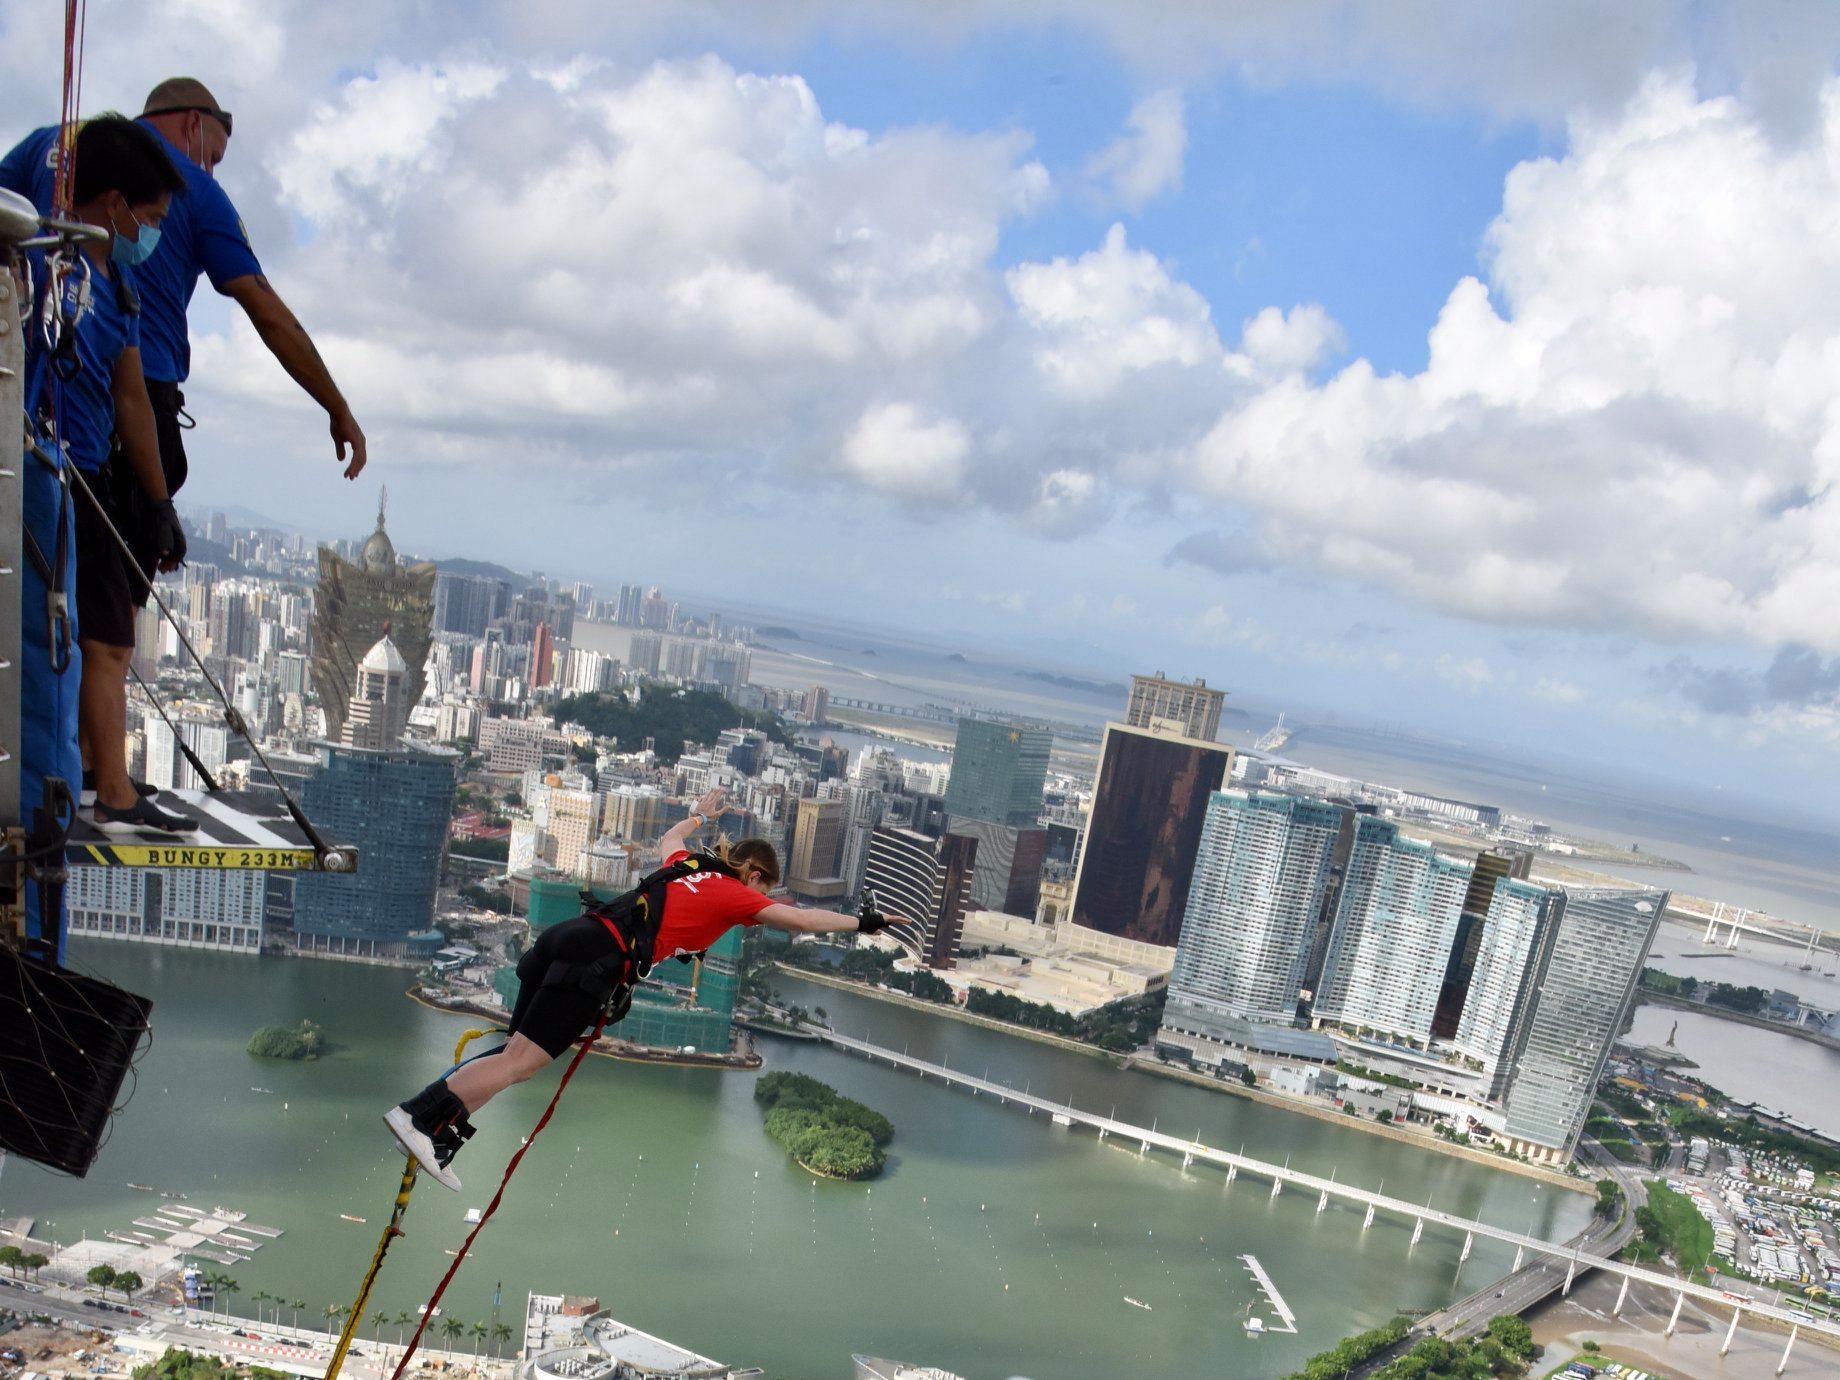 AJ Hackett Macau Bungy Jump Macau Lifestyle giveaway